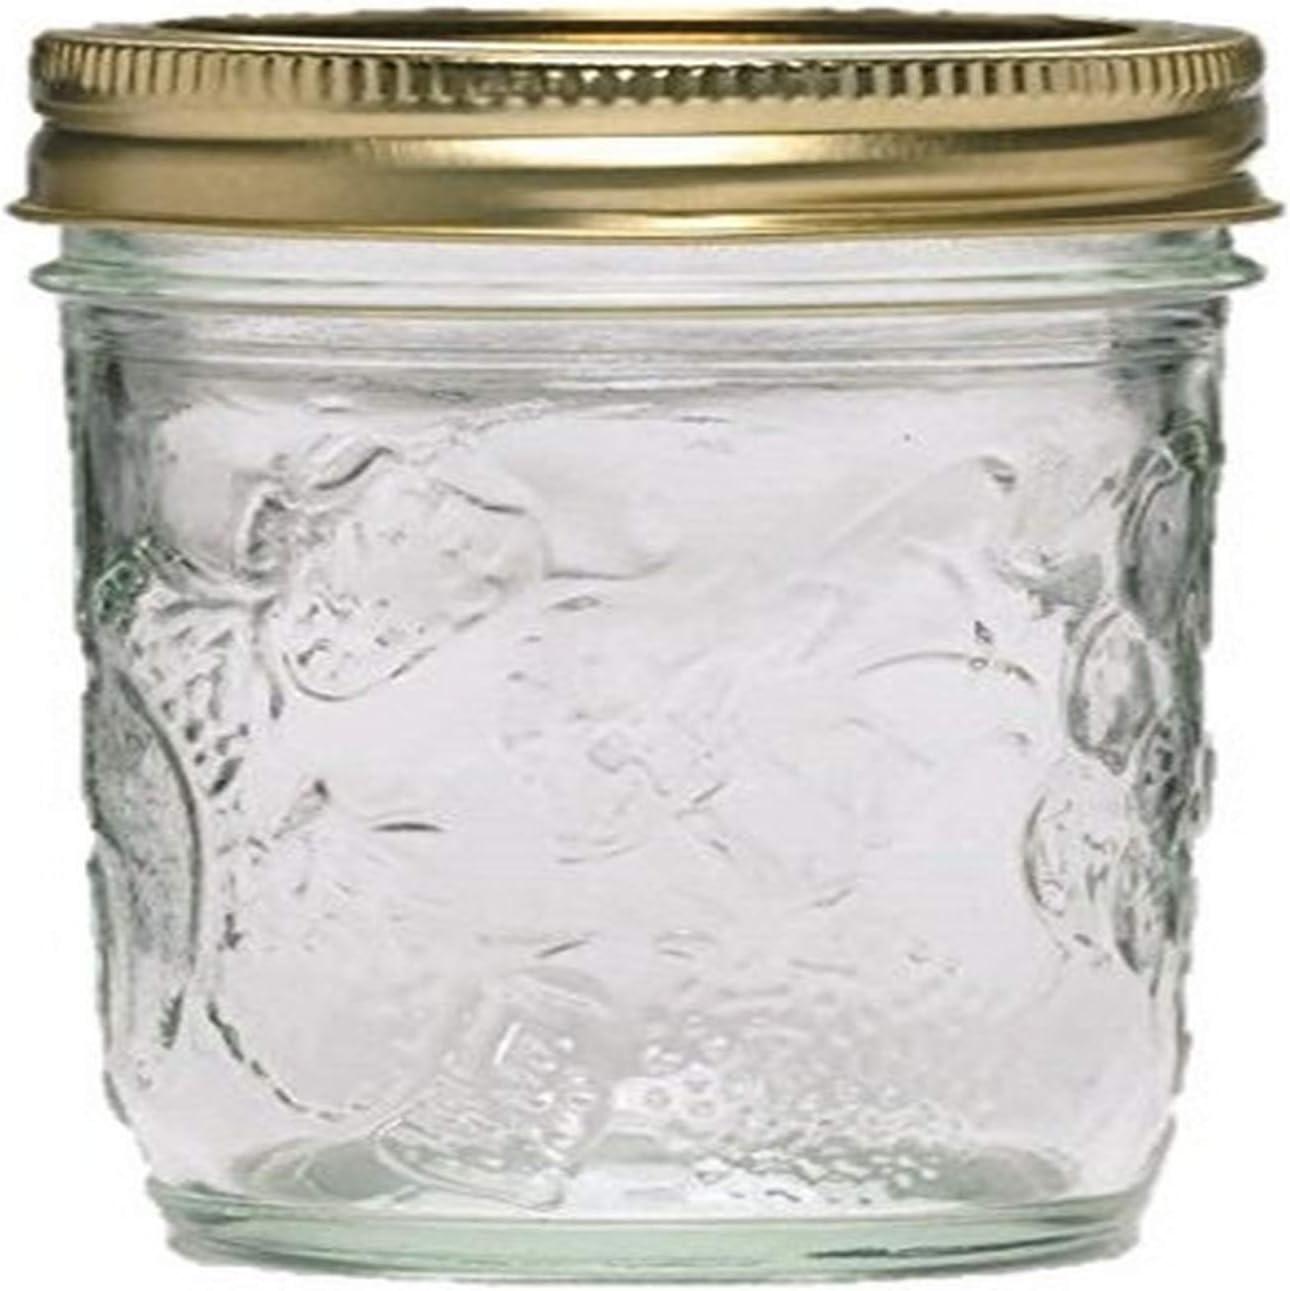 Ball Golden Harvest Mason Regular Mouth 8oz Jelly Jar 12PK